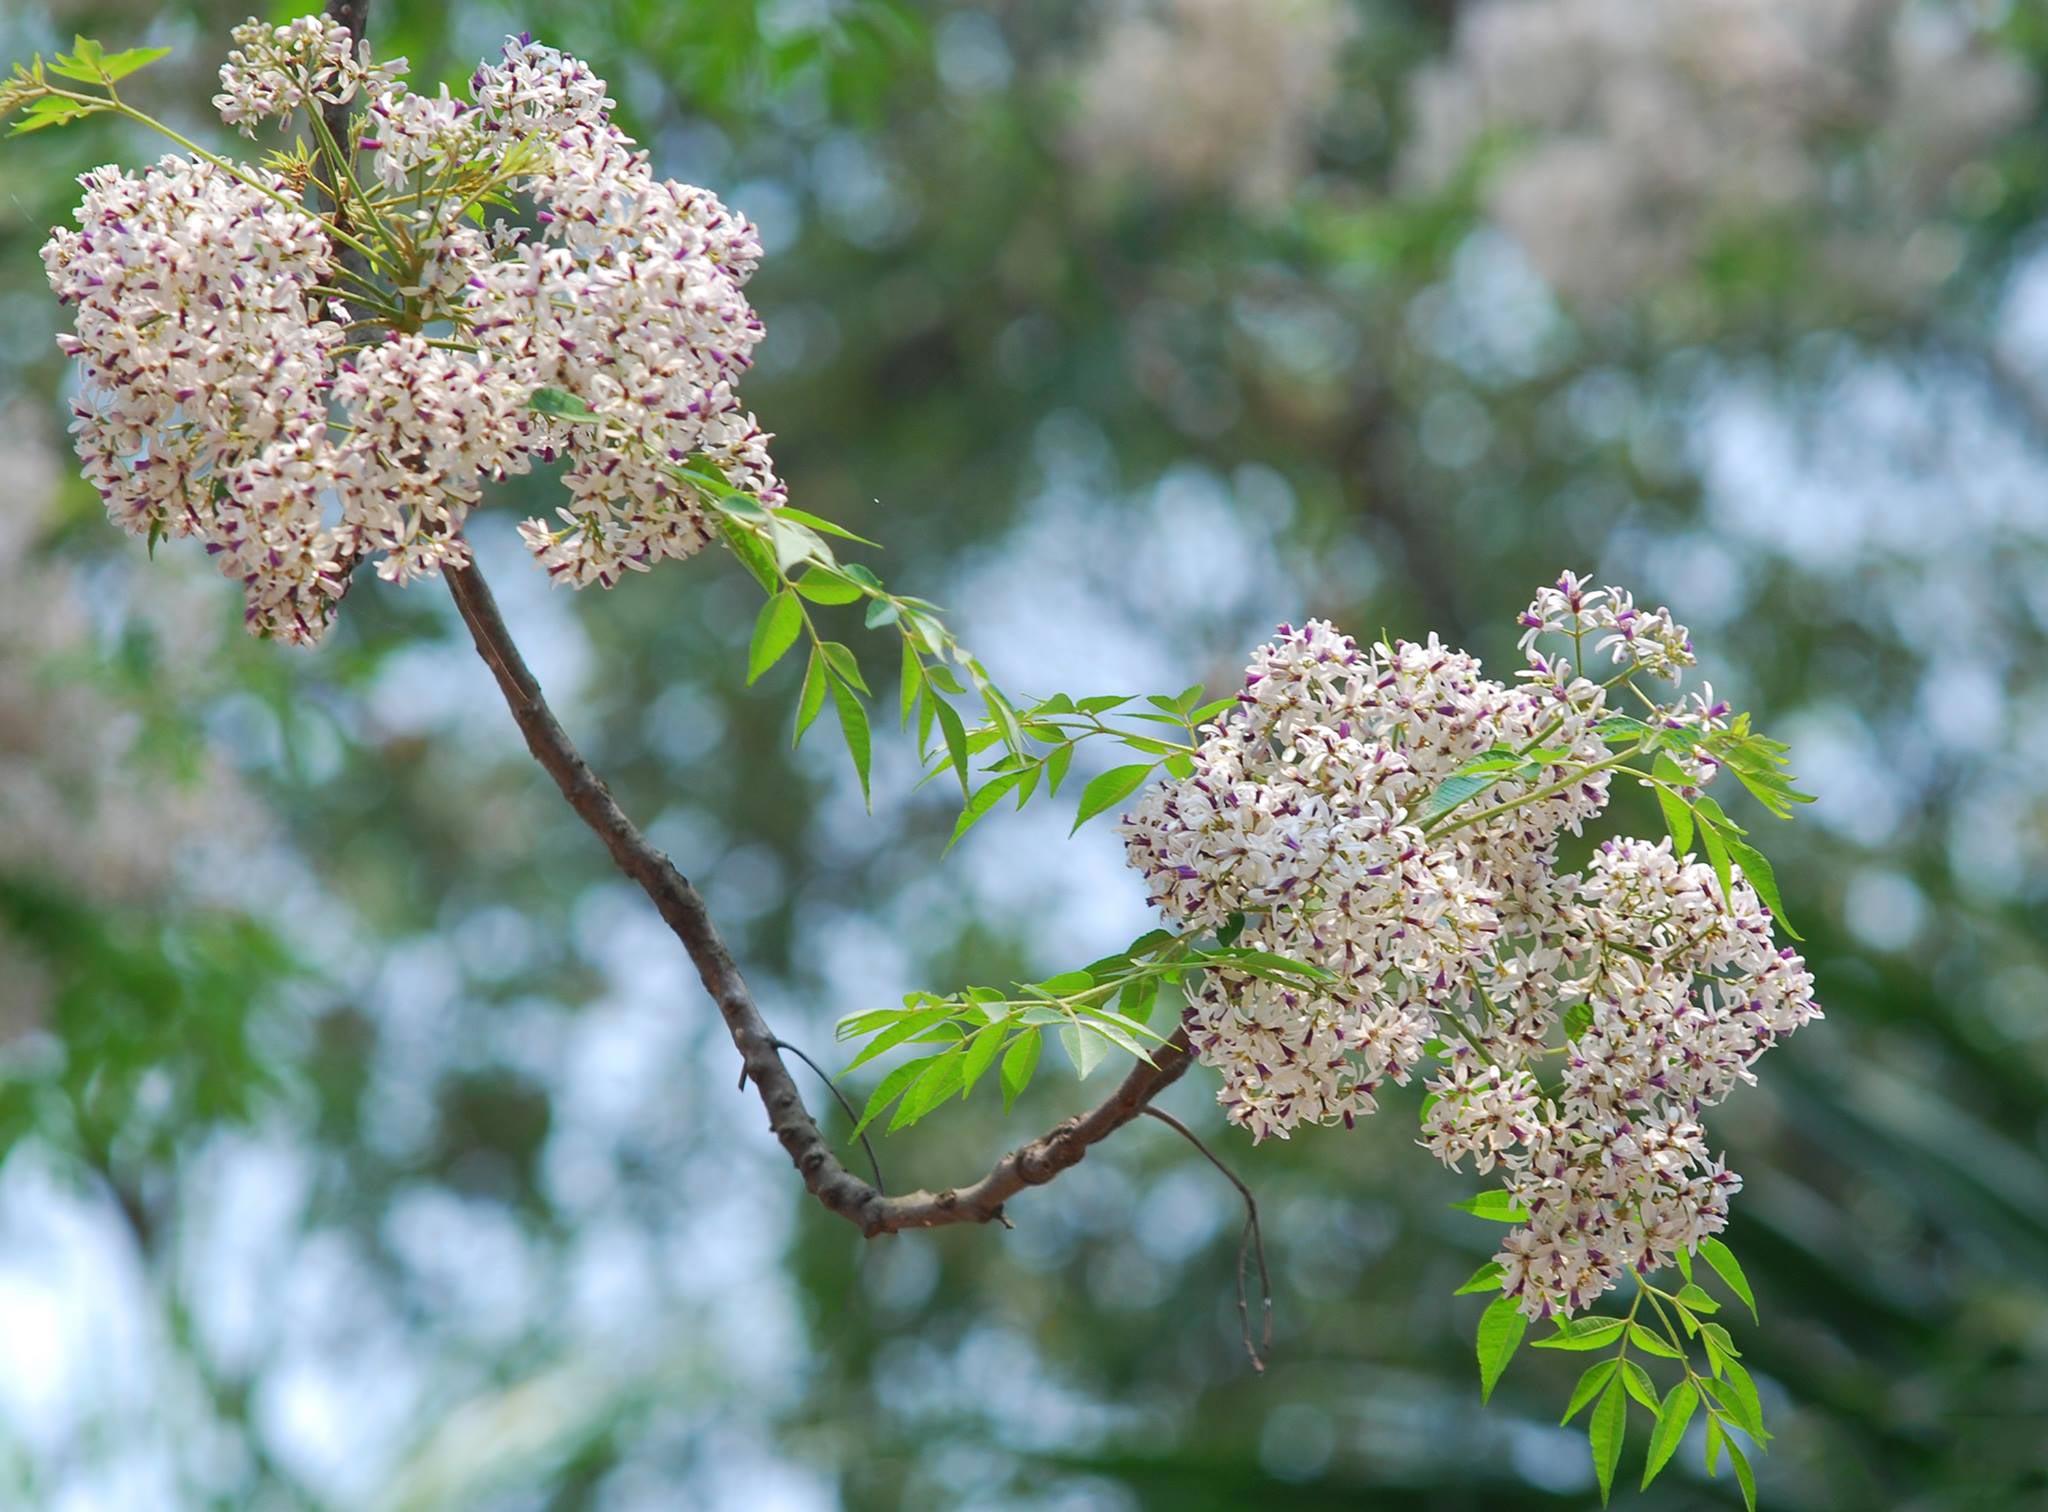 hoa xoan - hoa tươi văn nam 3